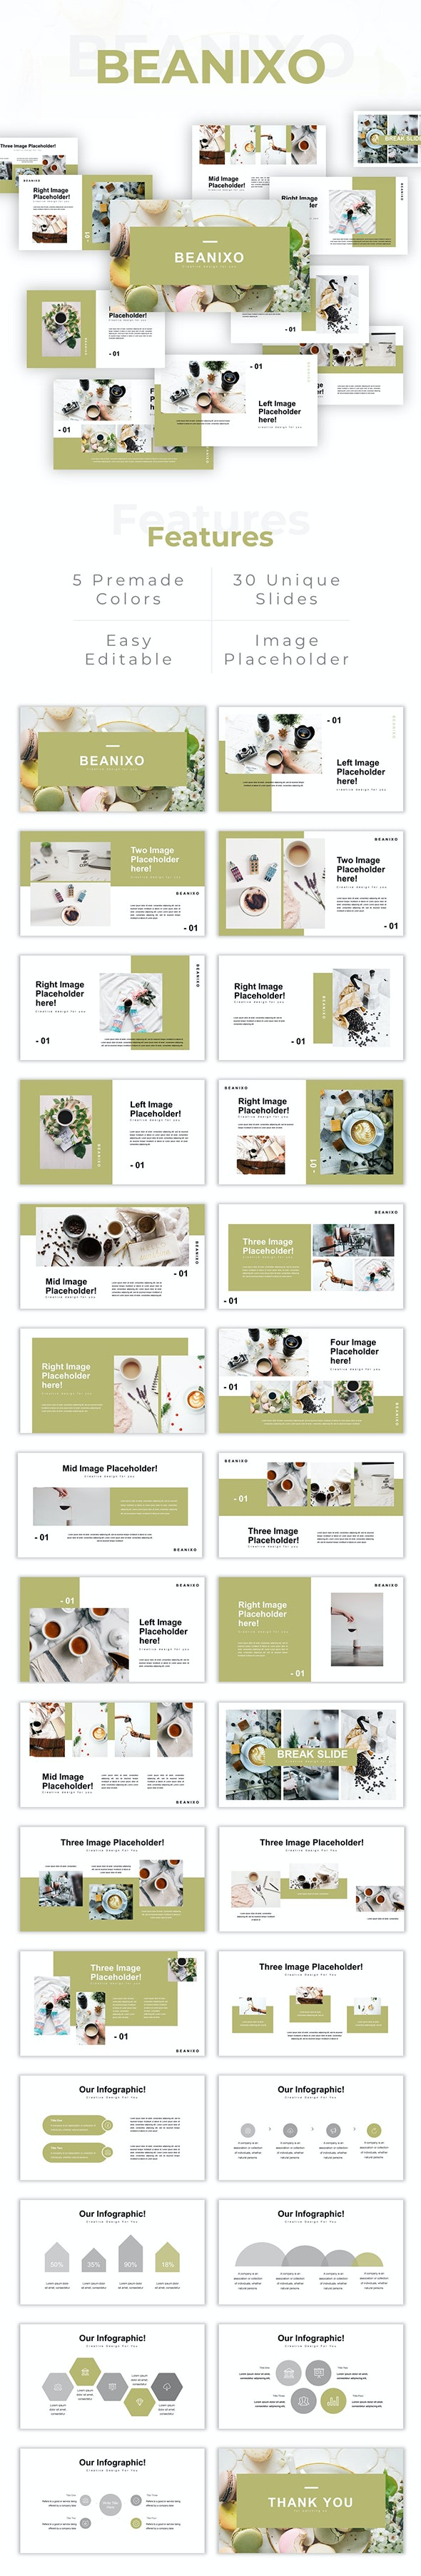 Beanixo - Creative Coffee Google Slides Templates - Google Slides Presentation Templates